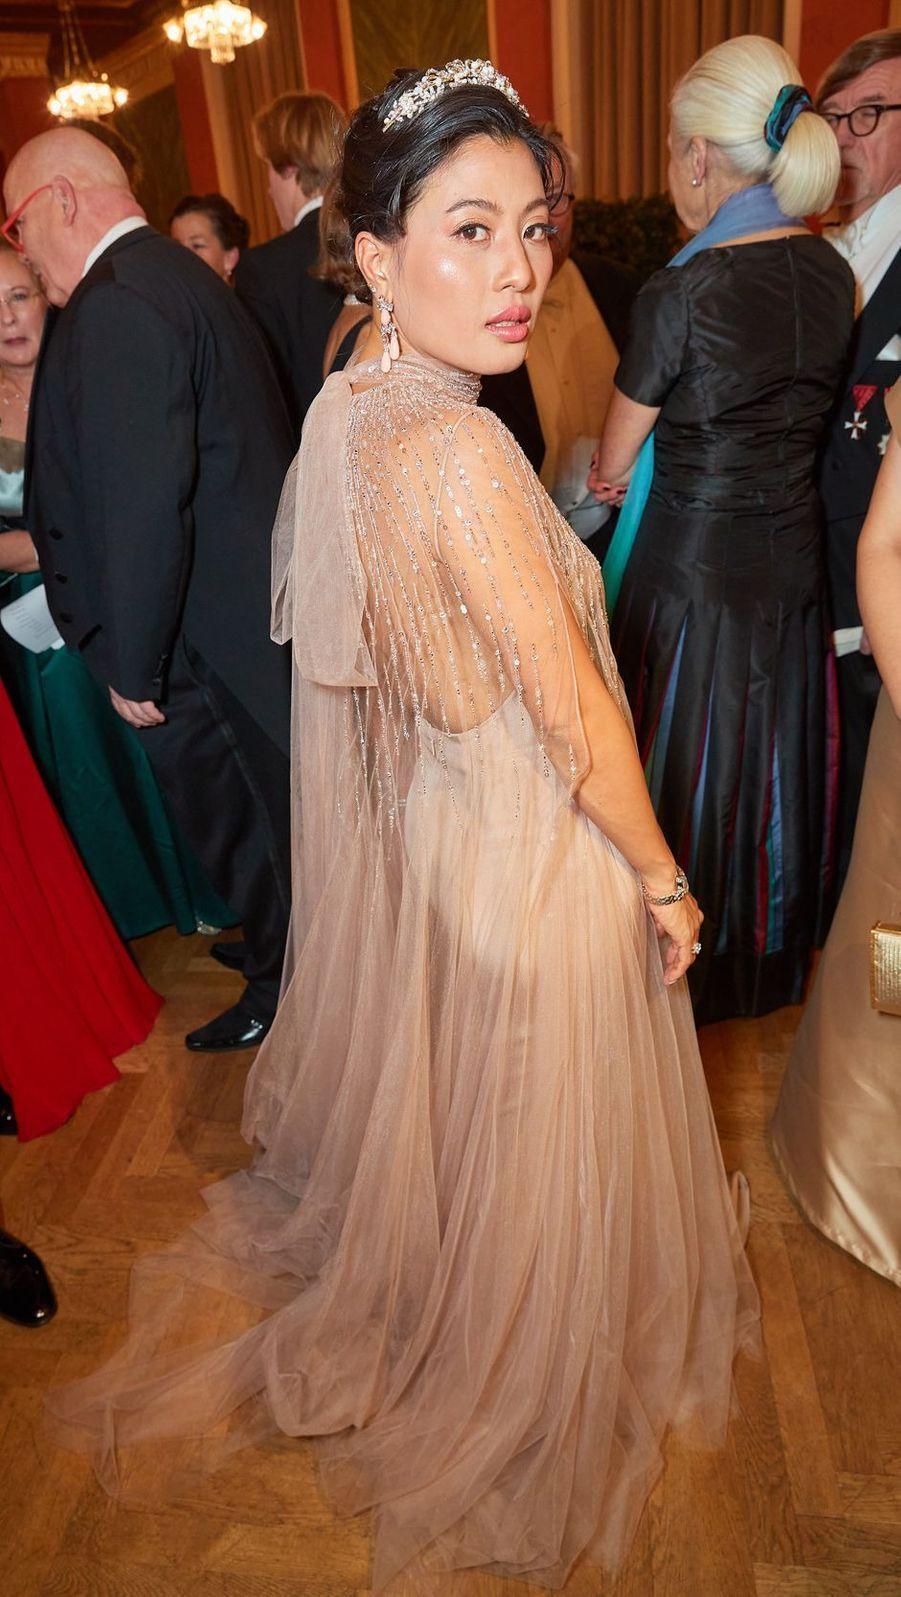 La princesse Sirivannavari Nariratana de Thaïlande à Vienne, le 23 janvier 2020